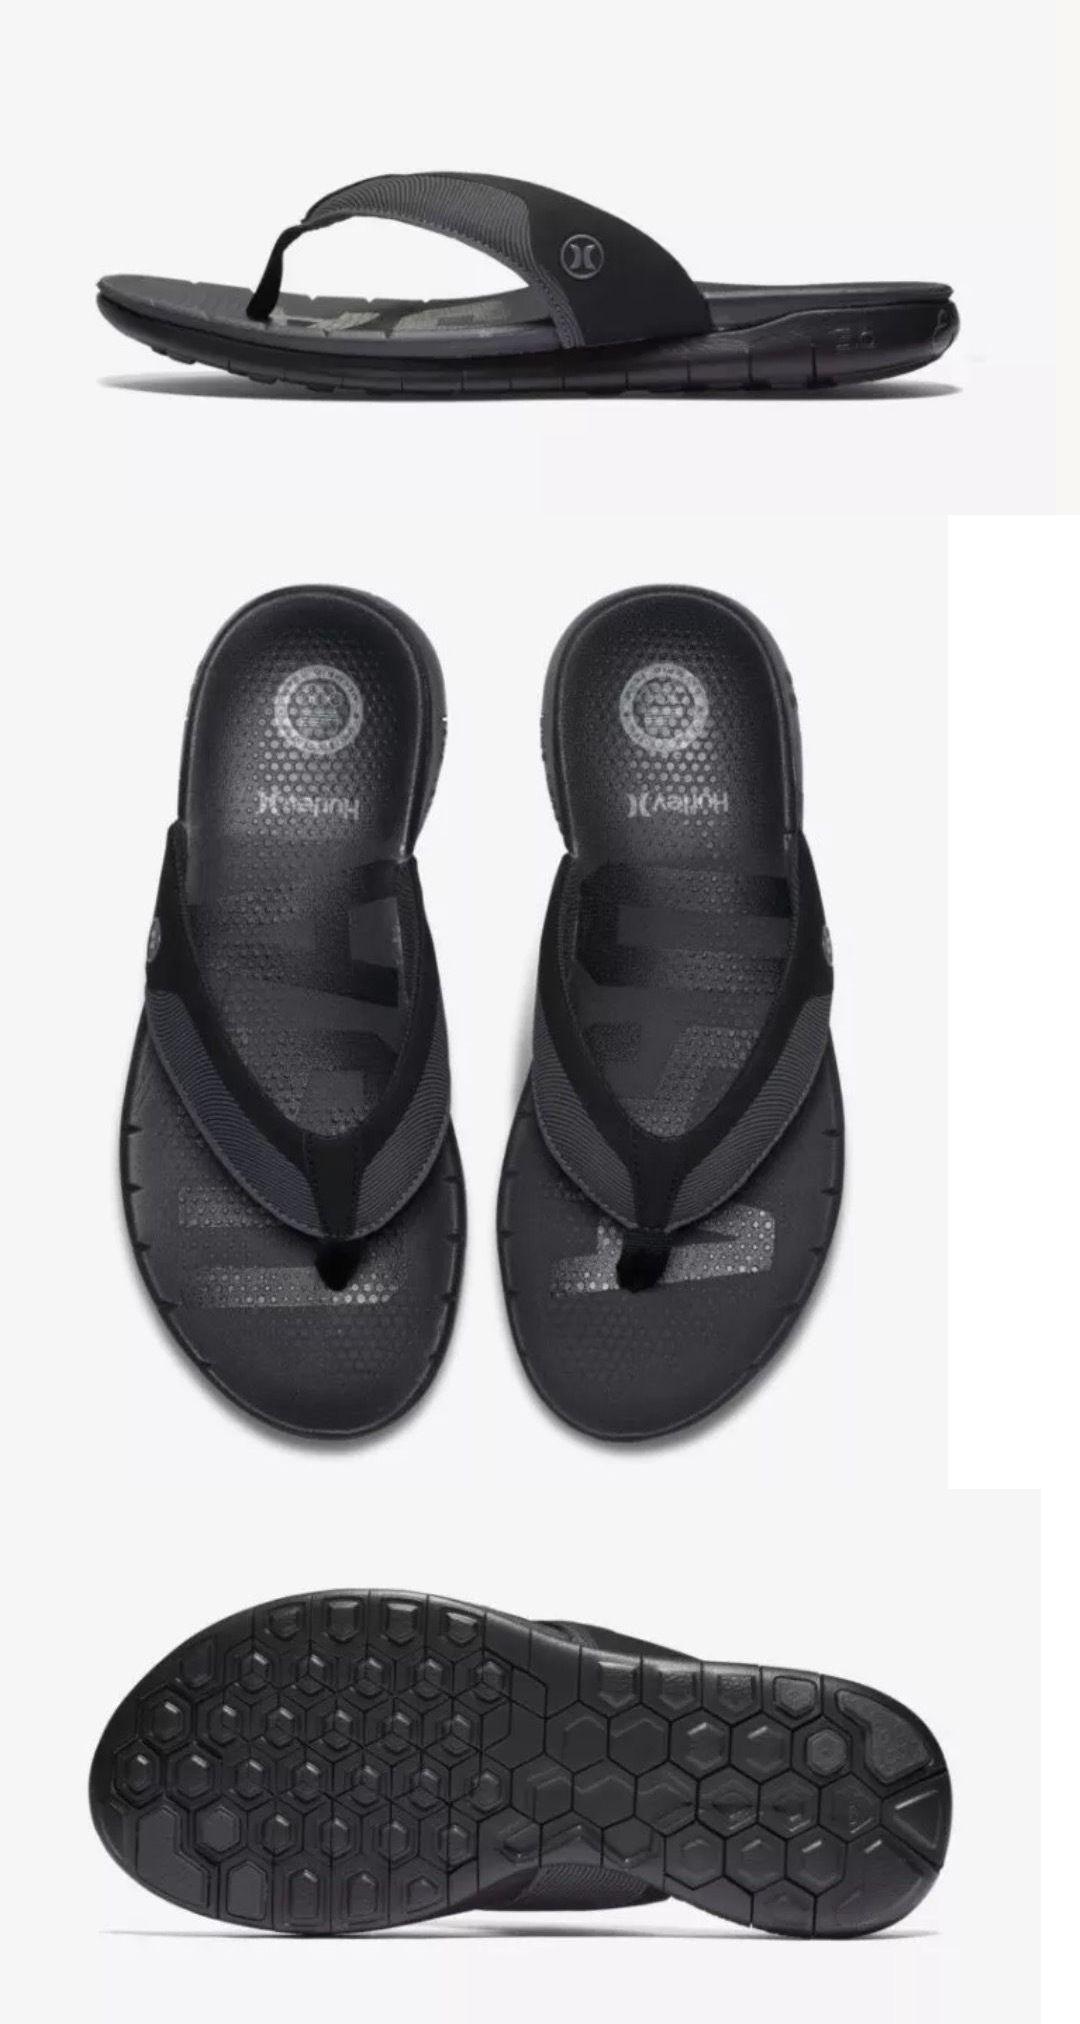 35ec49c4f37 Sandals and Flip Flops 11504  Men S Hurley Nike  70 Phantom Free Team Usa  Black Flip Flop Sandals - Size 12 -  BUY IT NOW ONLY   32.95 on eBay!